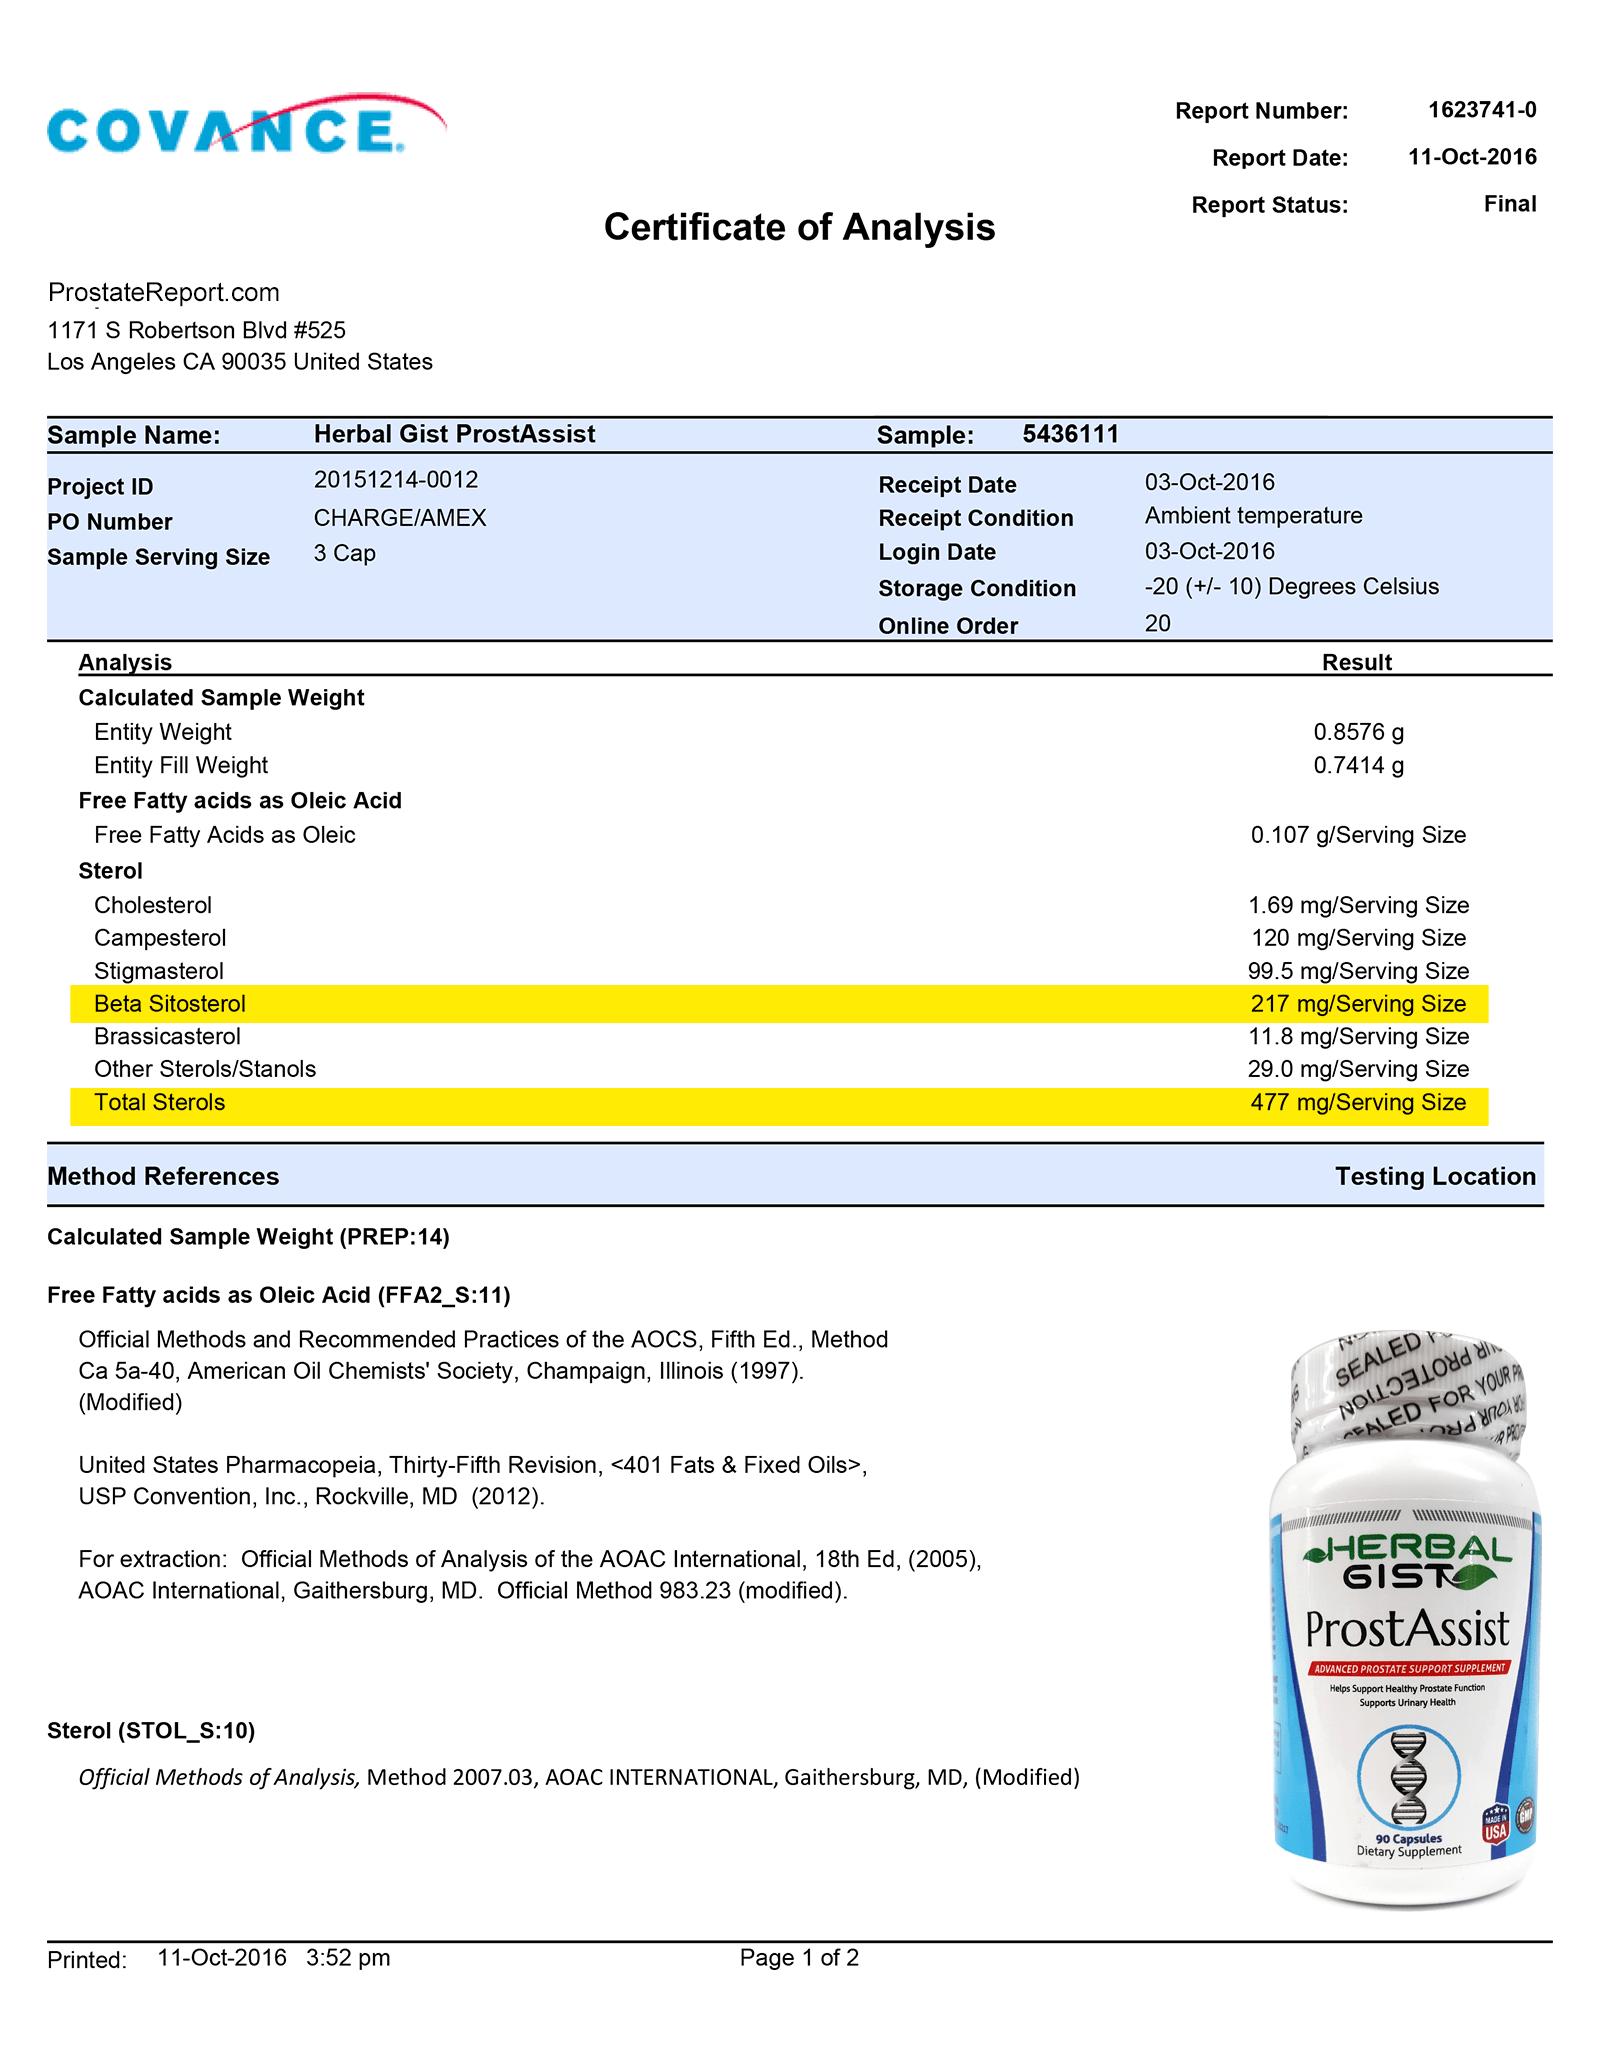 Prostassist lab report